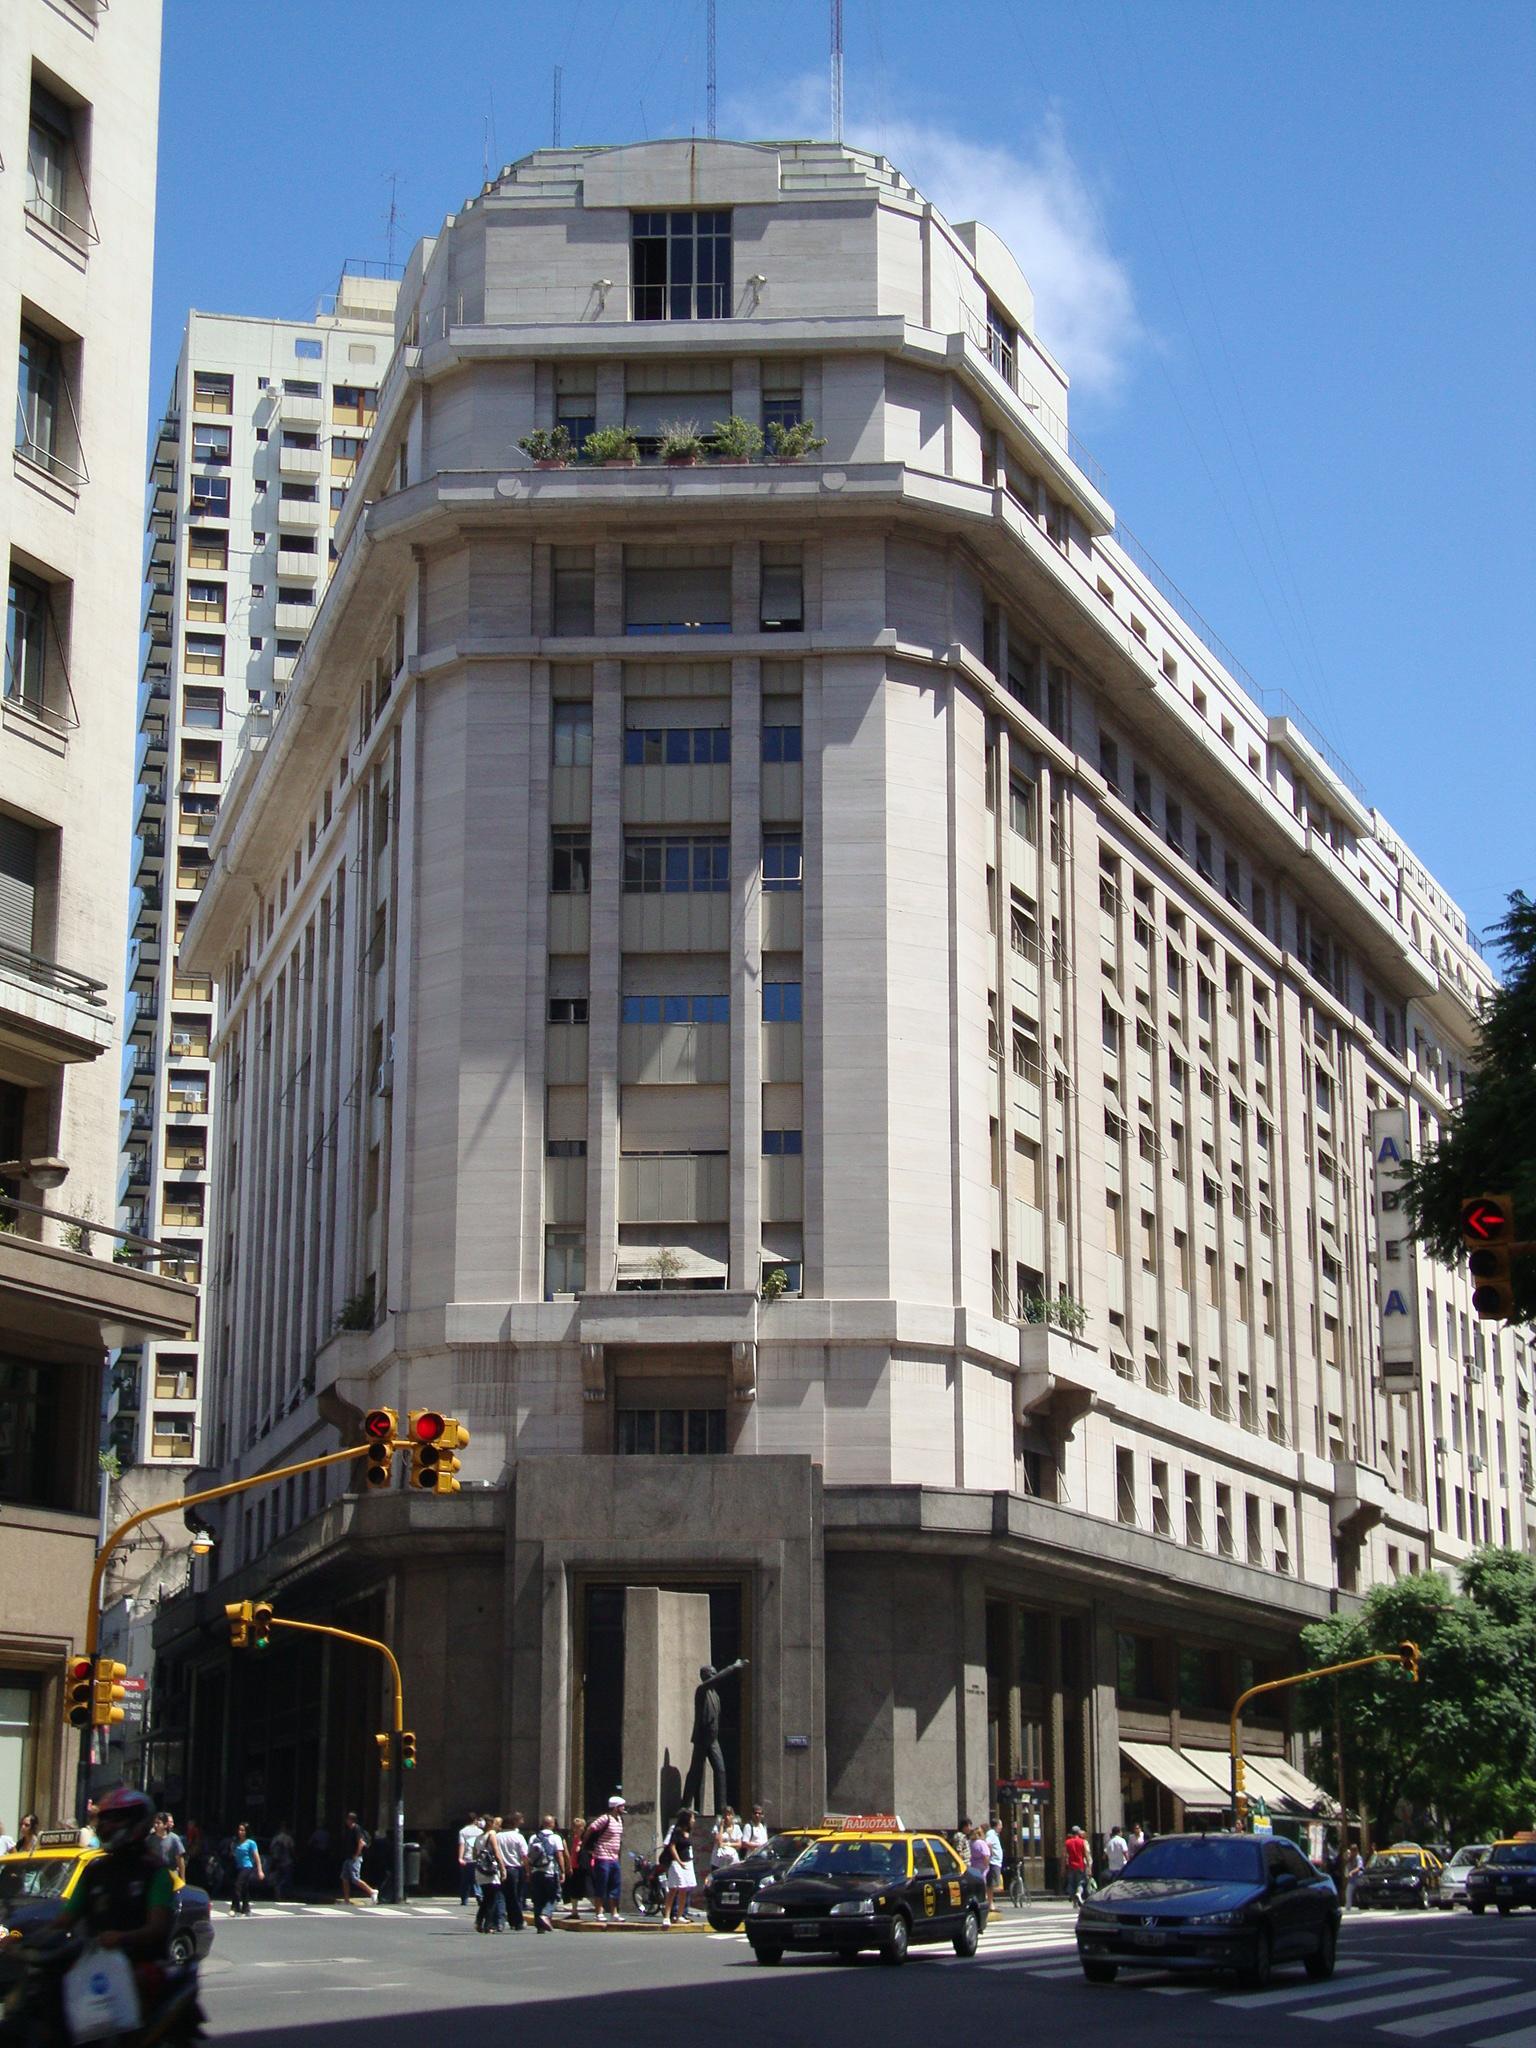 Edificio Volta - Wikipedia, la enciclopedia libre